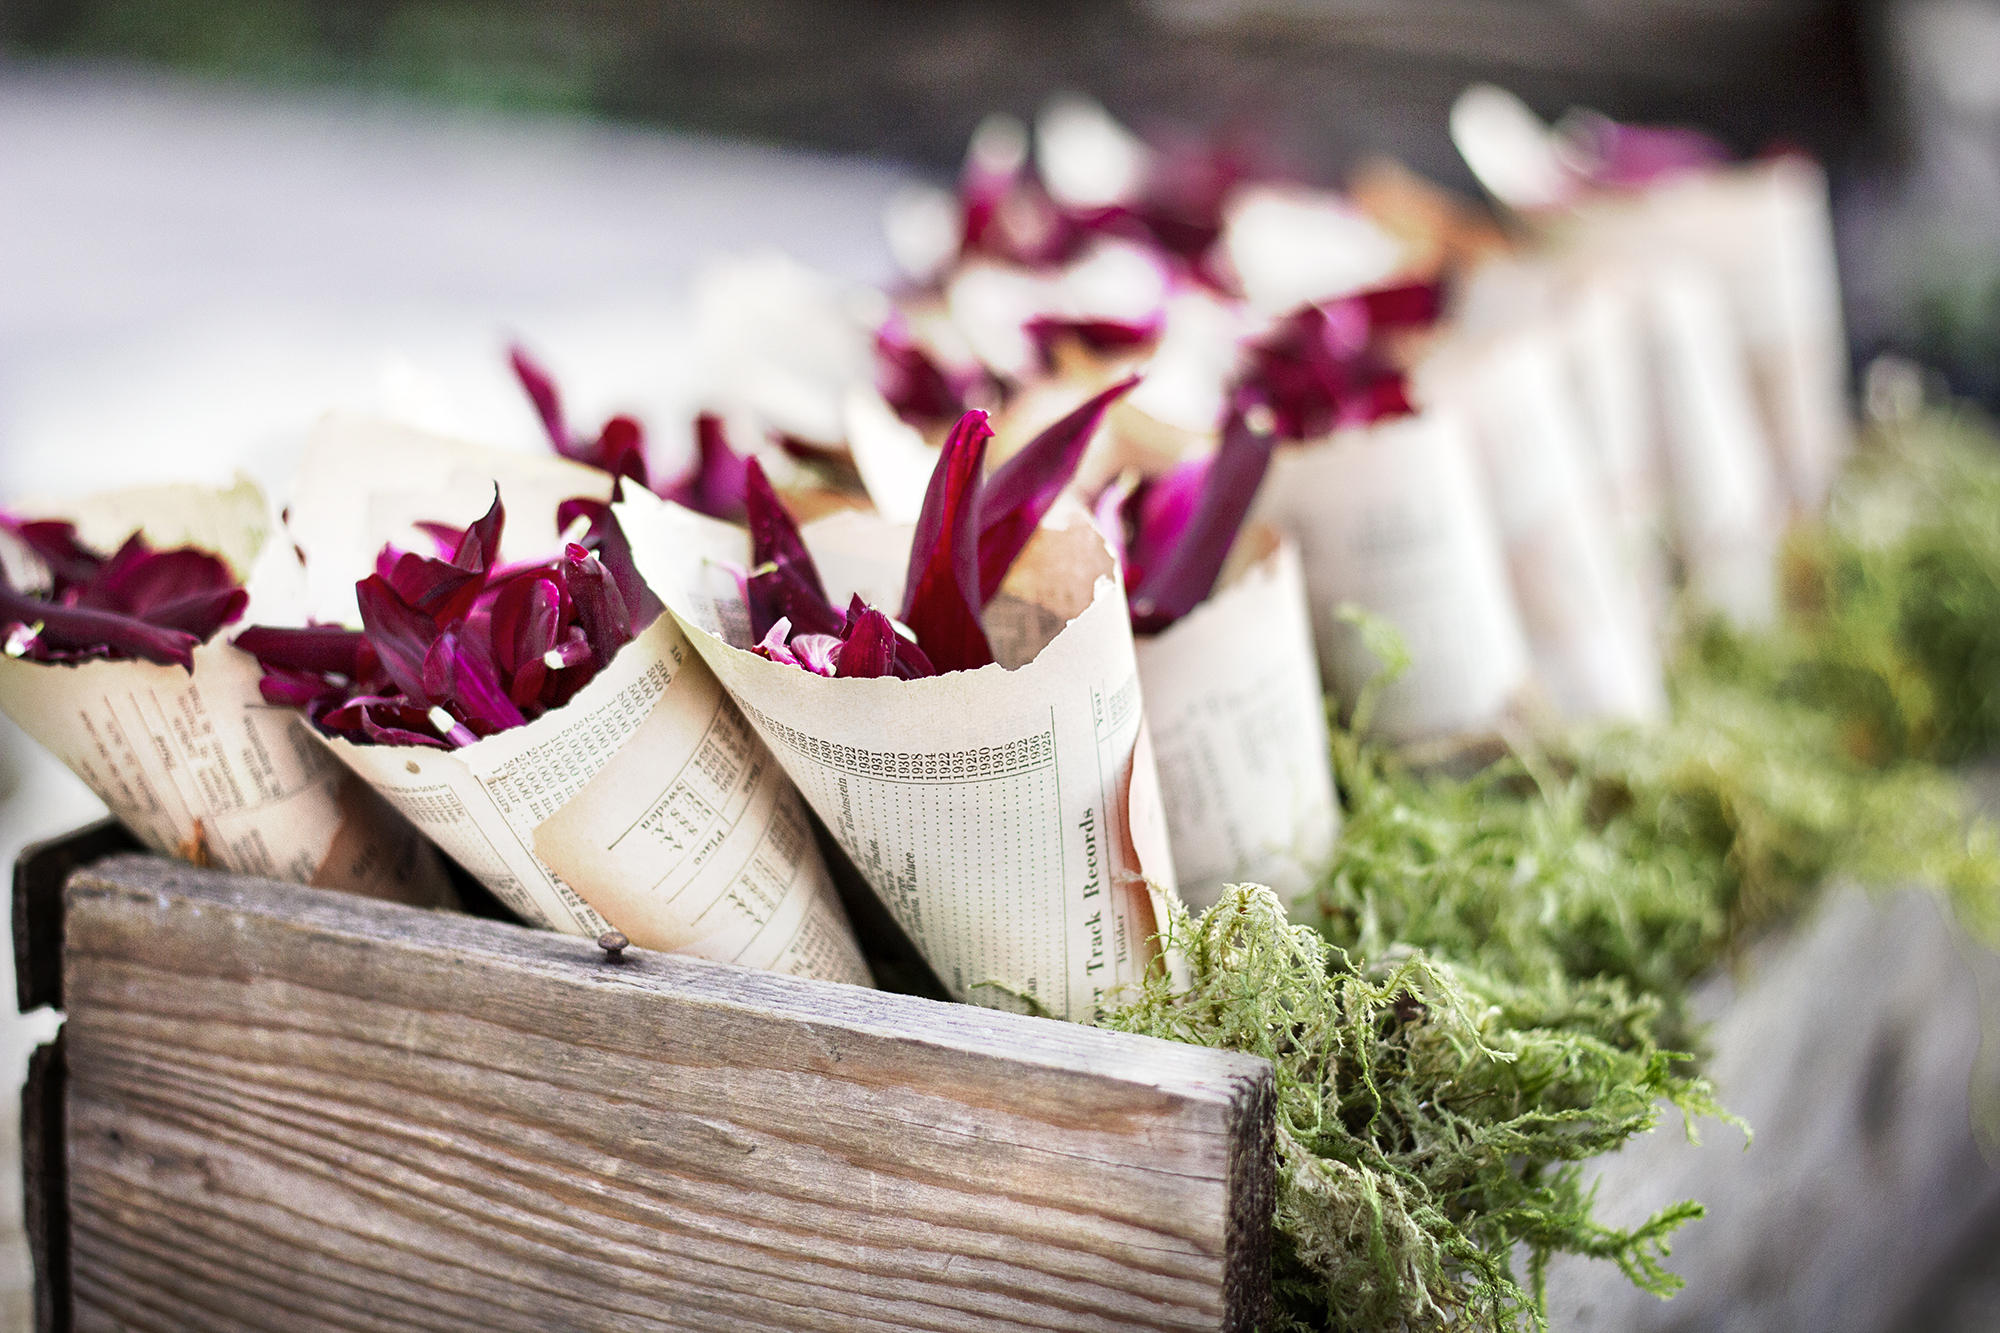 reduced_ss_pc_events_petals_paper_cones_wedding_confetti.jpg